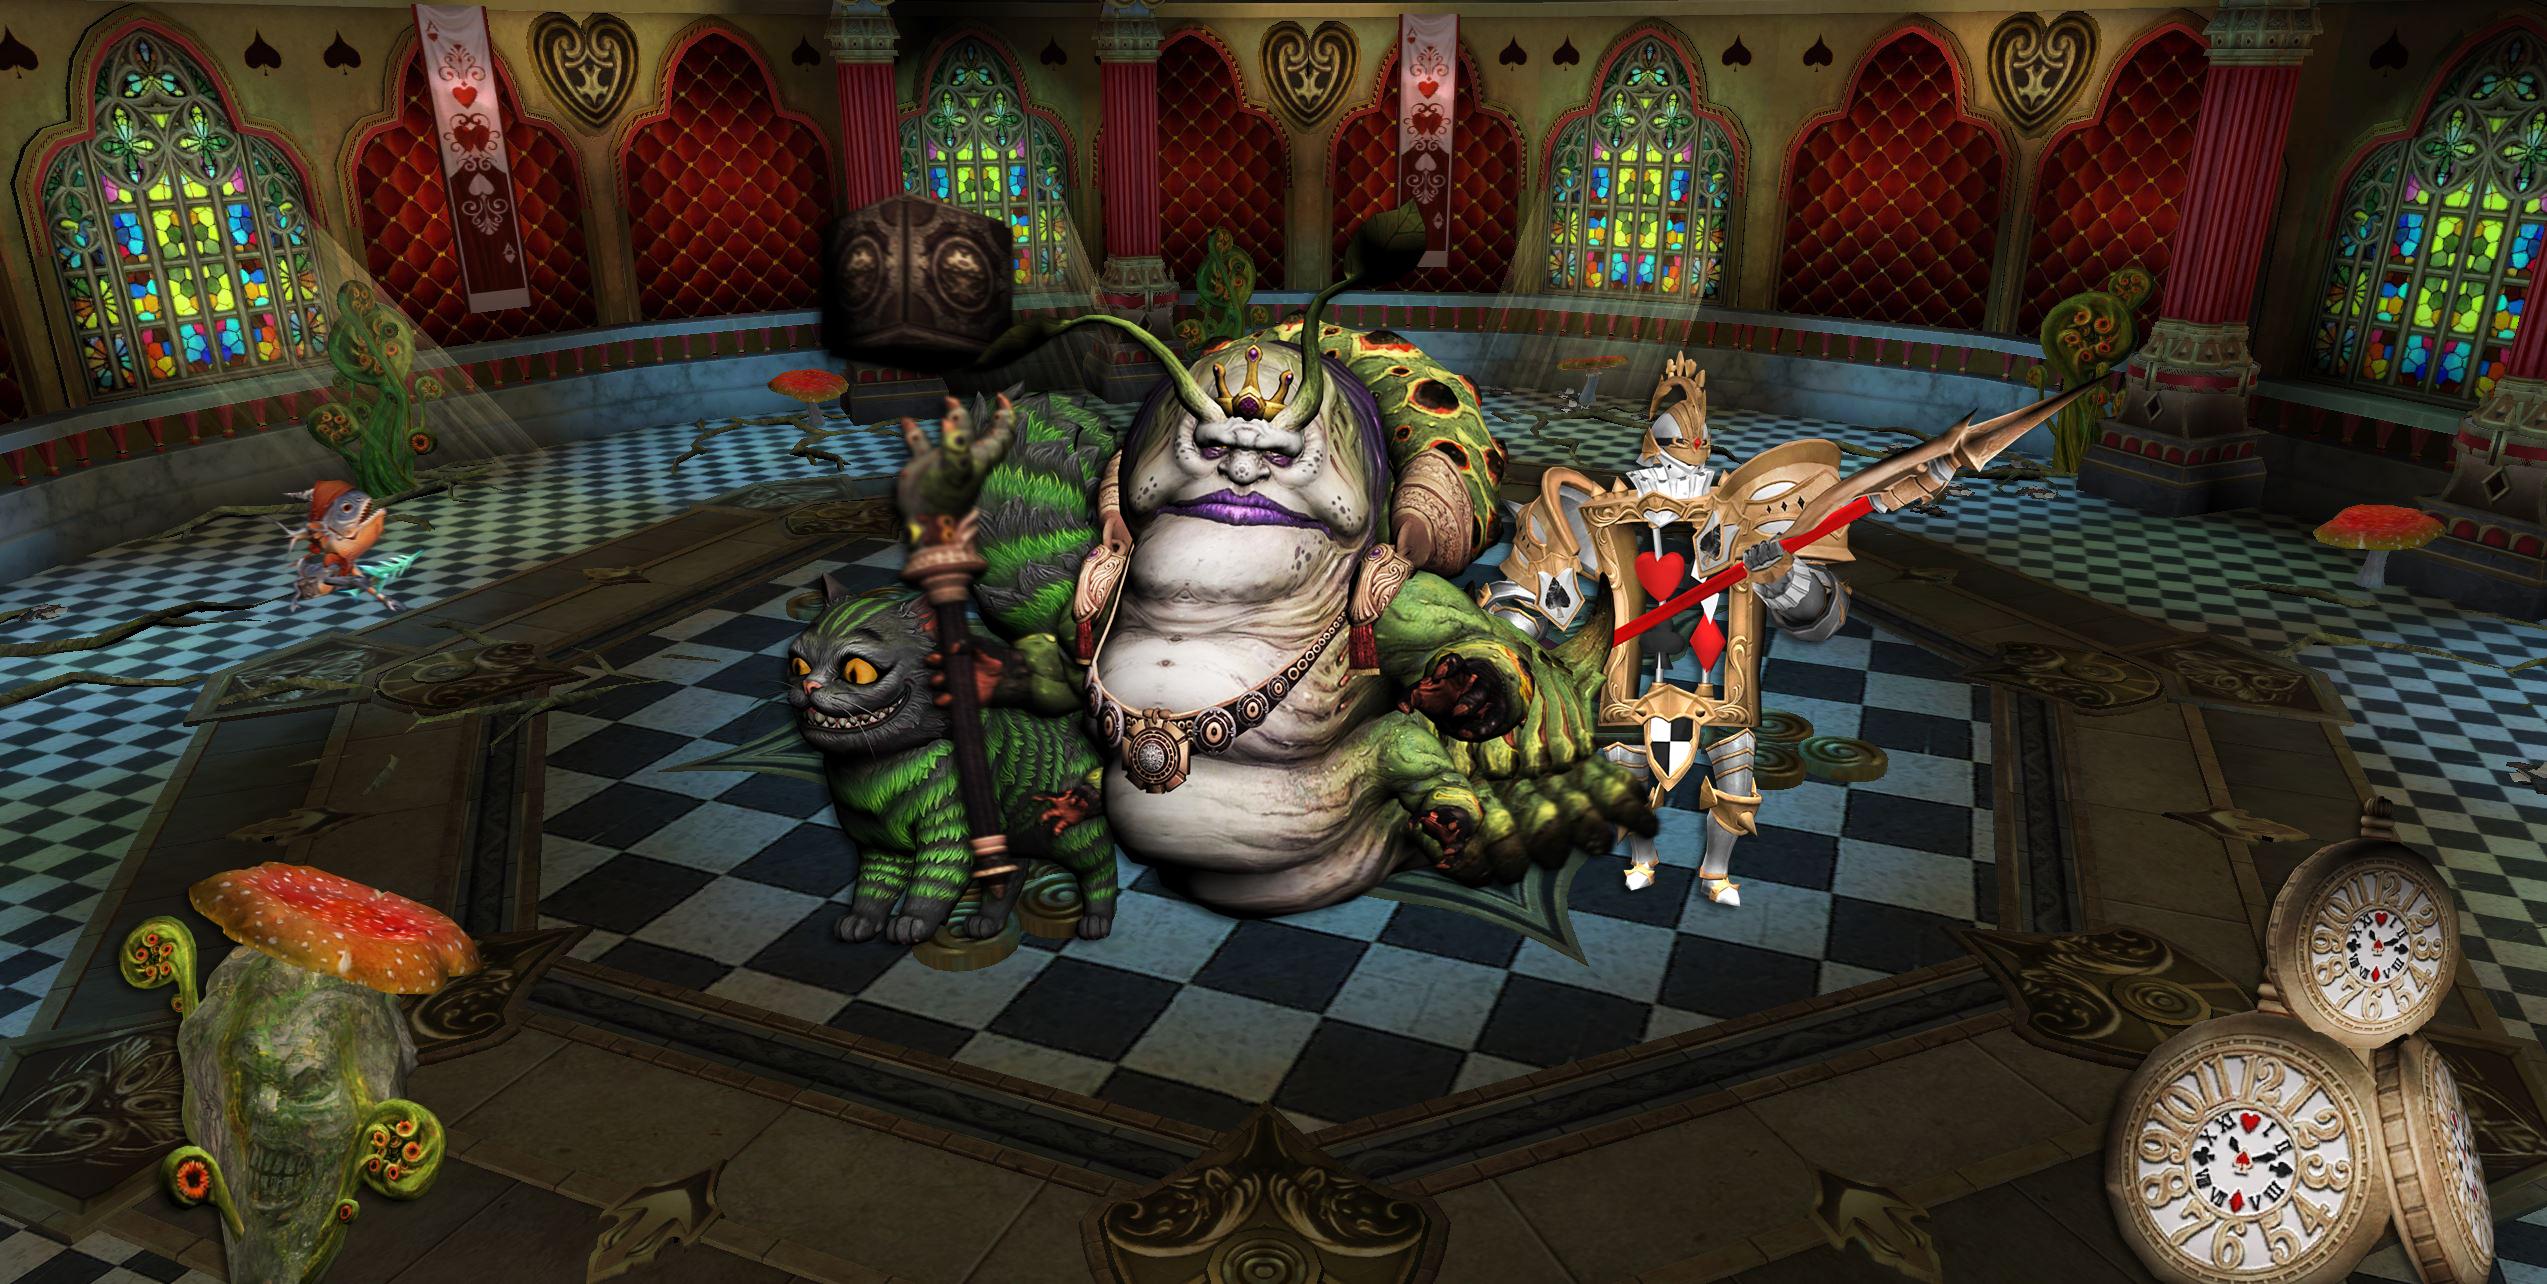 Wonderland palace